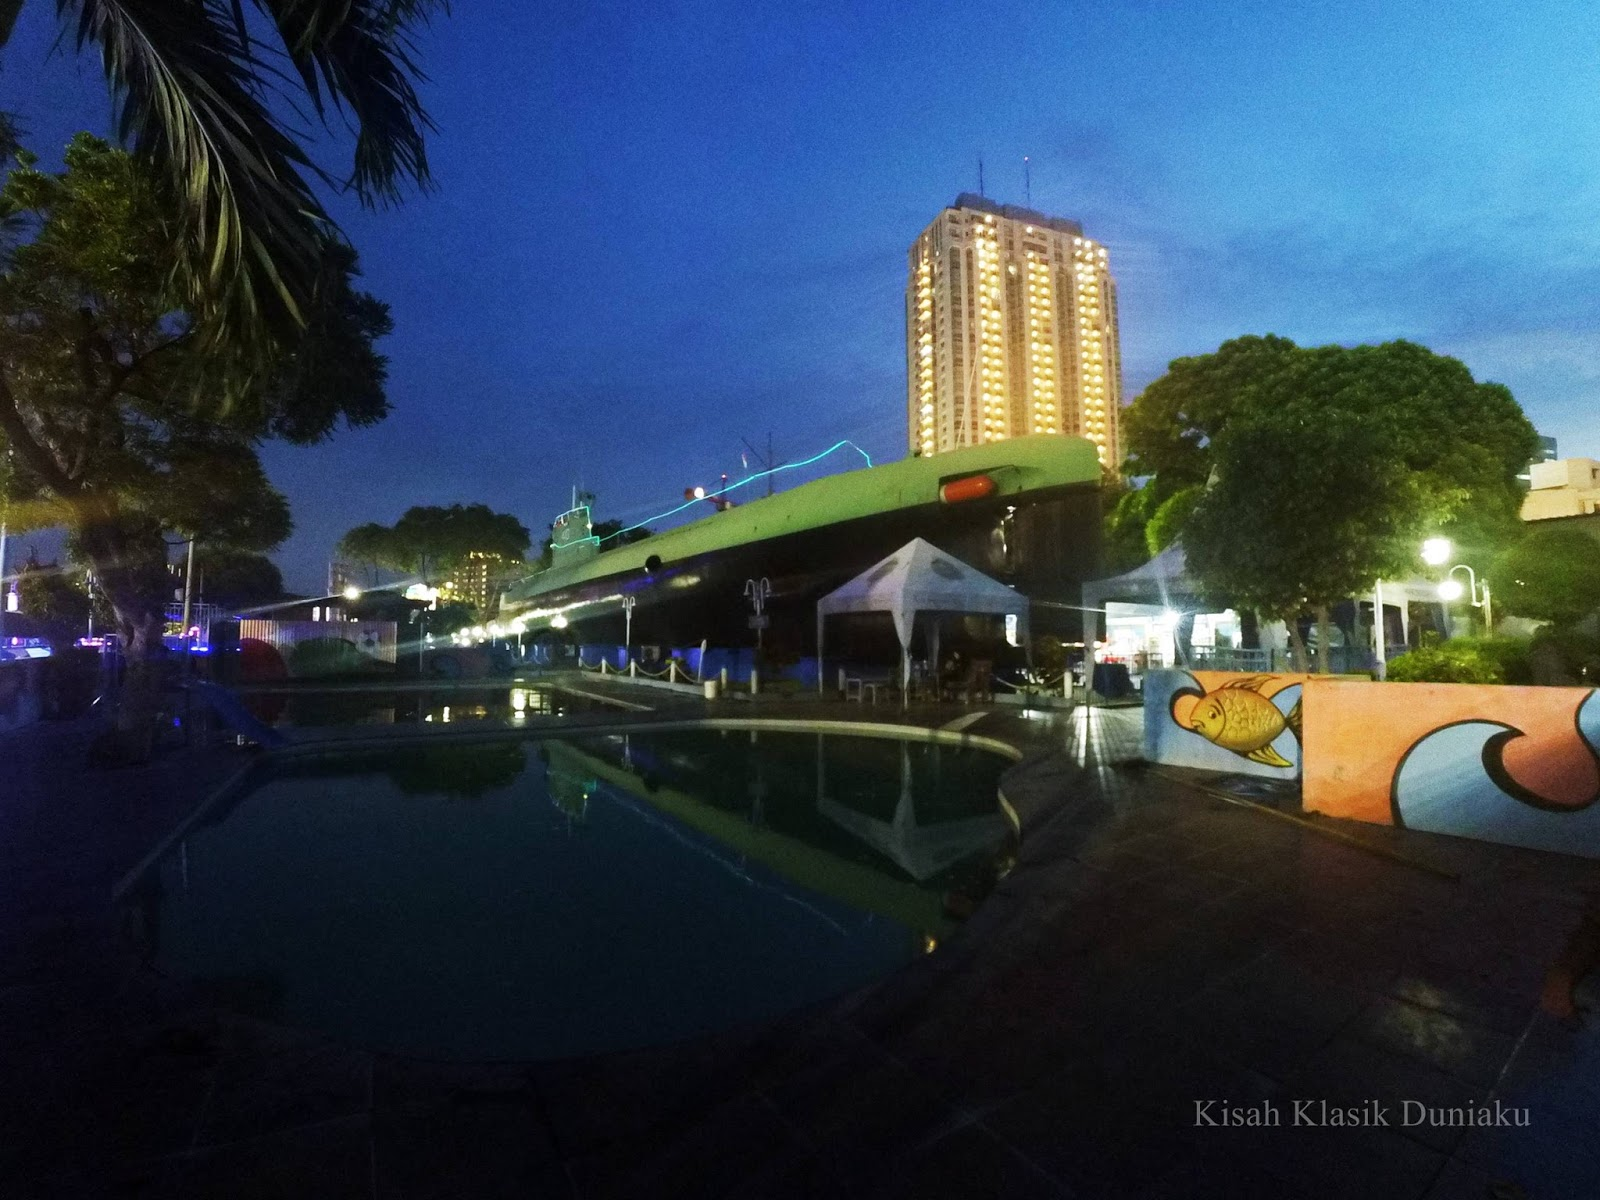 Kisah Klasik Duniaku Wisata Unik Surabaya Monkasel Aja Bilang Bikin